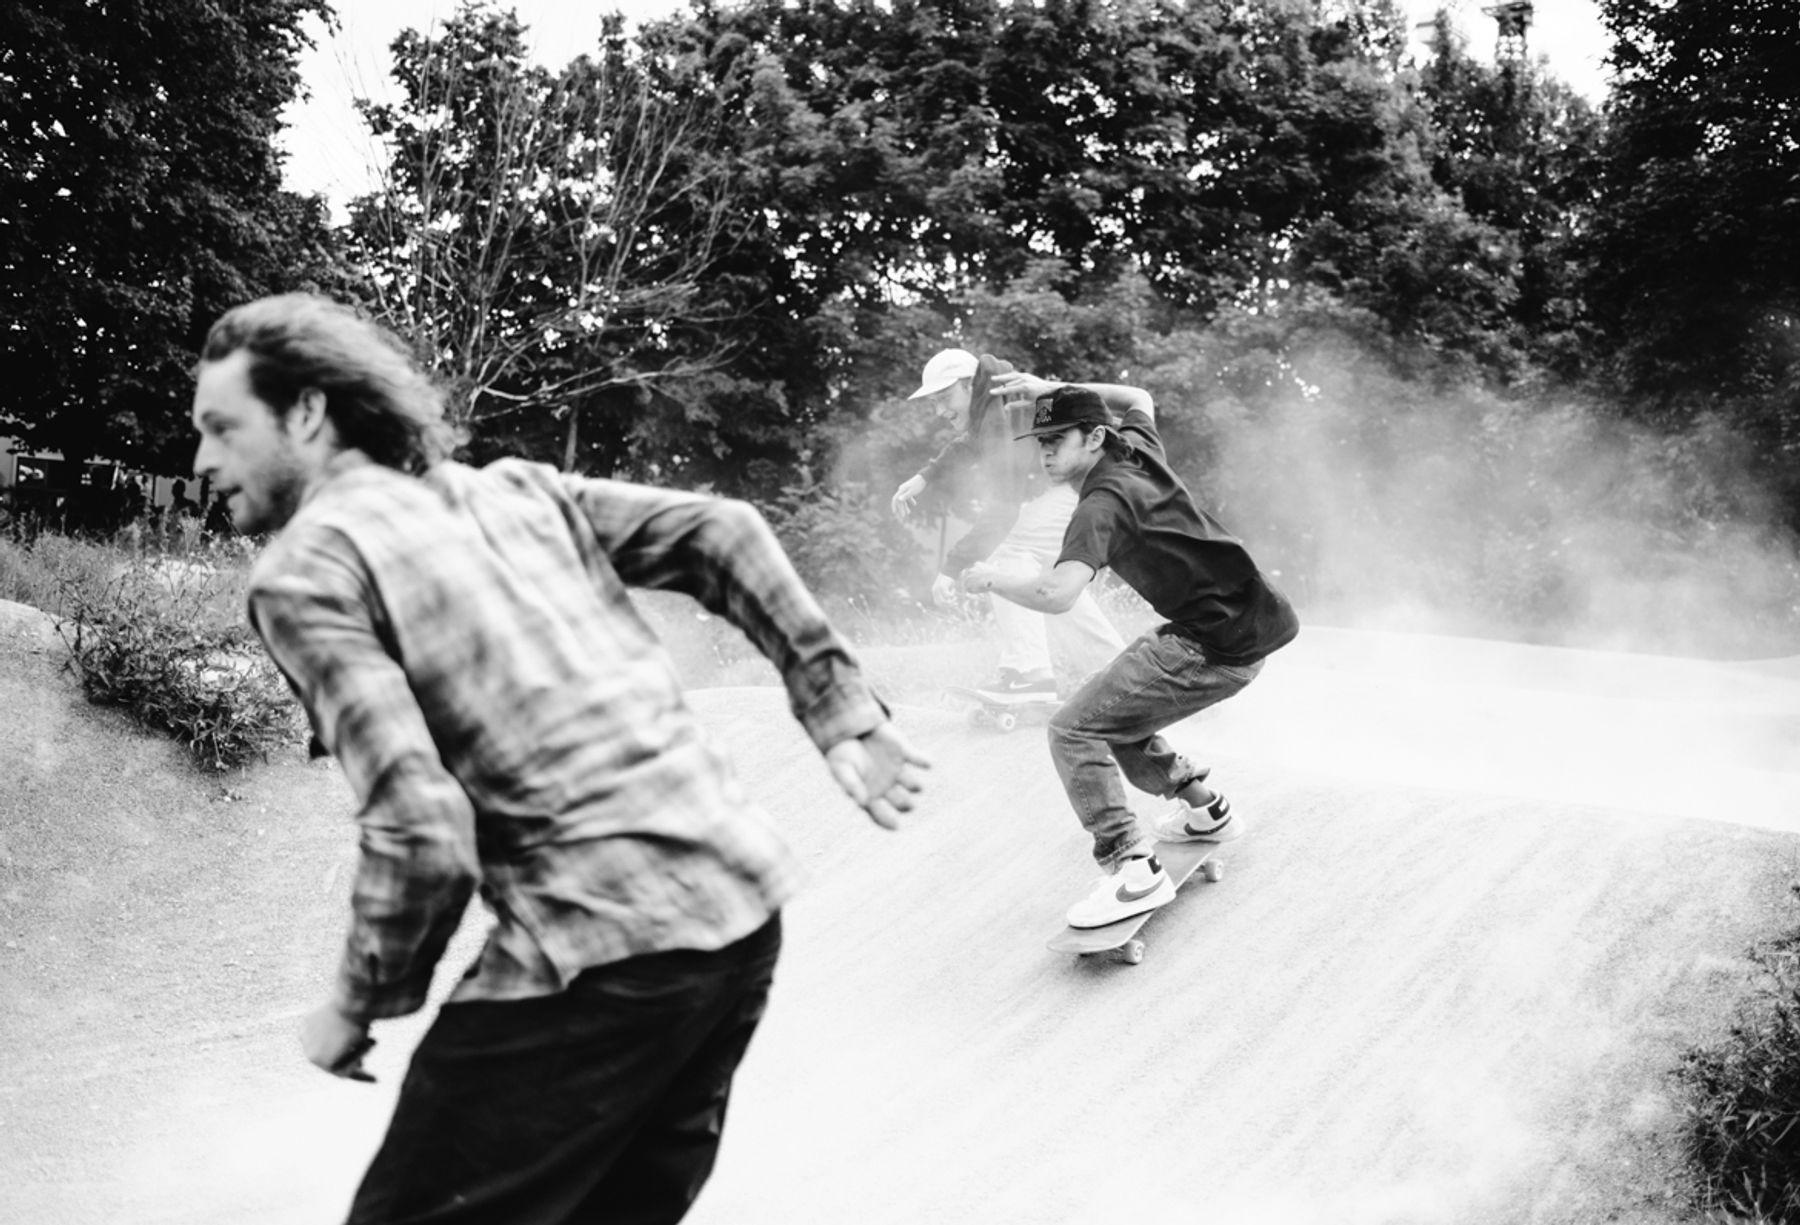 _IHC7814e-Donovon-Piscopo-Casper-Brooker-Willis-Kimbel-Nike-SB-x-Slam-City-Skates-Go-Skateboarding-Day-London-June-2015-Photographer-Maksim-Kalanep